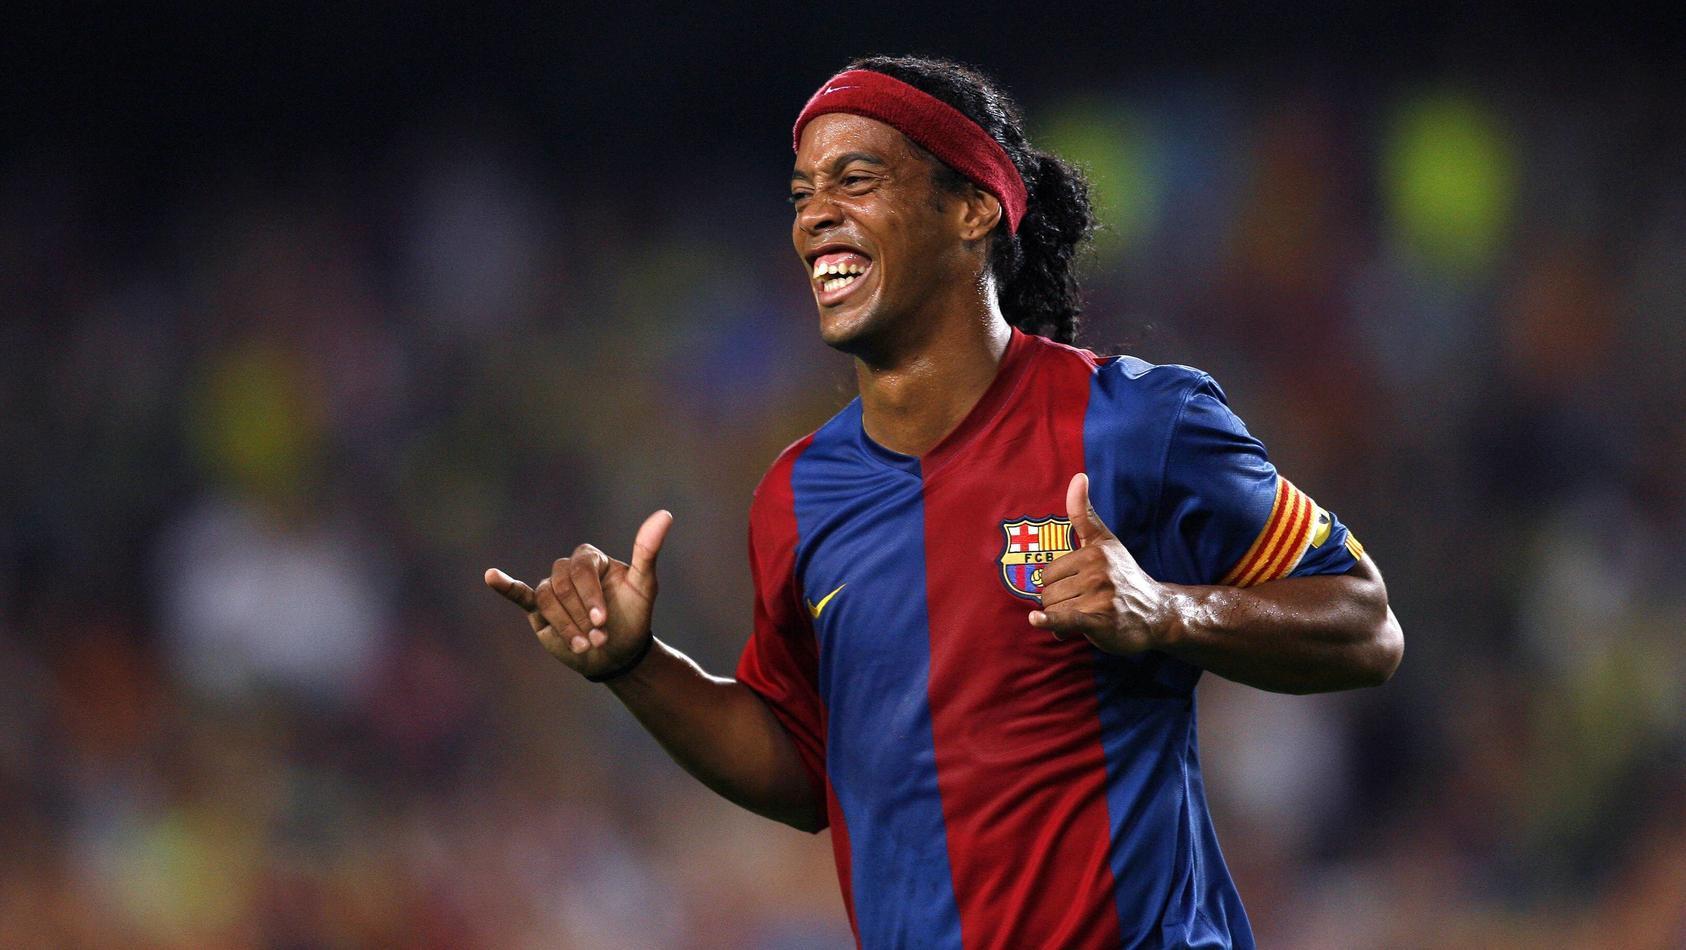 Ronaldinho (FC Barcelona) - Torjubel - PUBLICATIONxNOTxINxFRAxITA (pan15748)